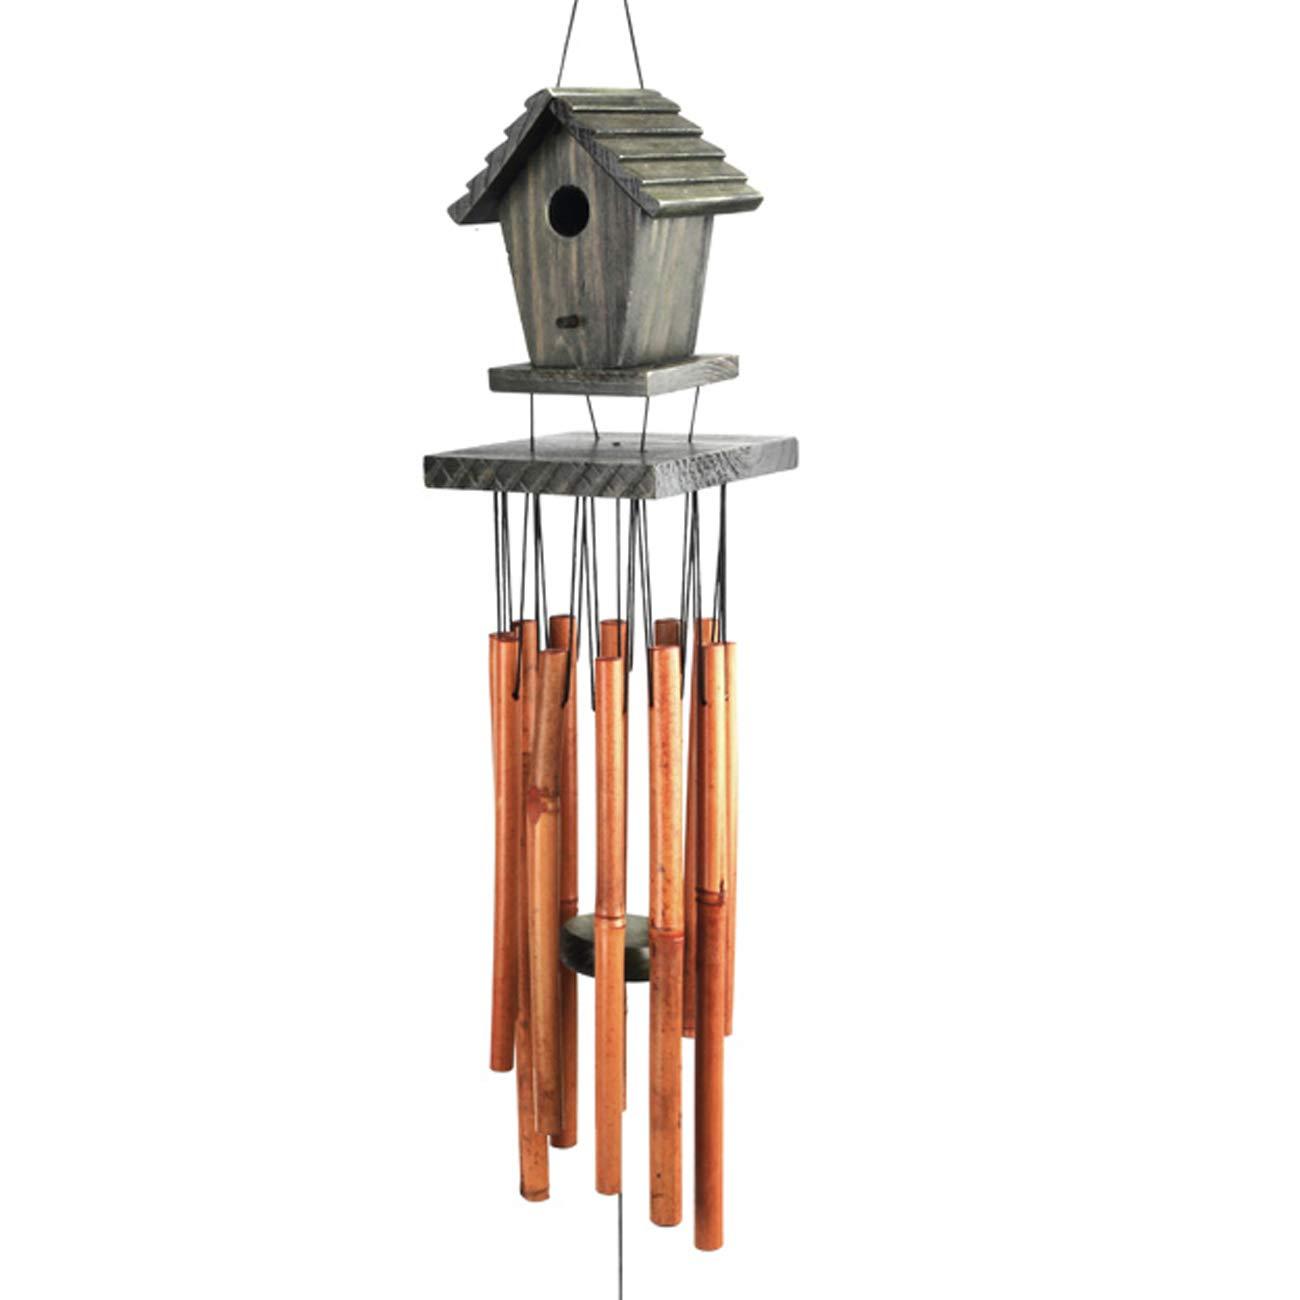 WOODMUSIC Wind Chimes, 36'' Large Birdhouse Windchimes Amazing Grace Garden, Patio, Balcony Indoor & Outdoor (Birdhouse g)